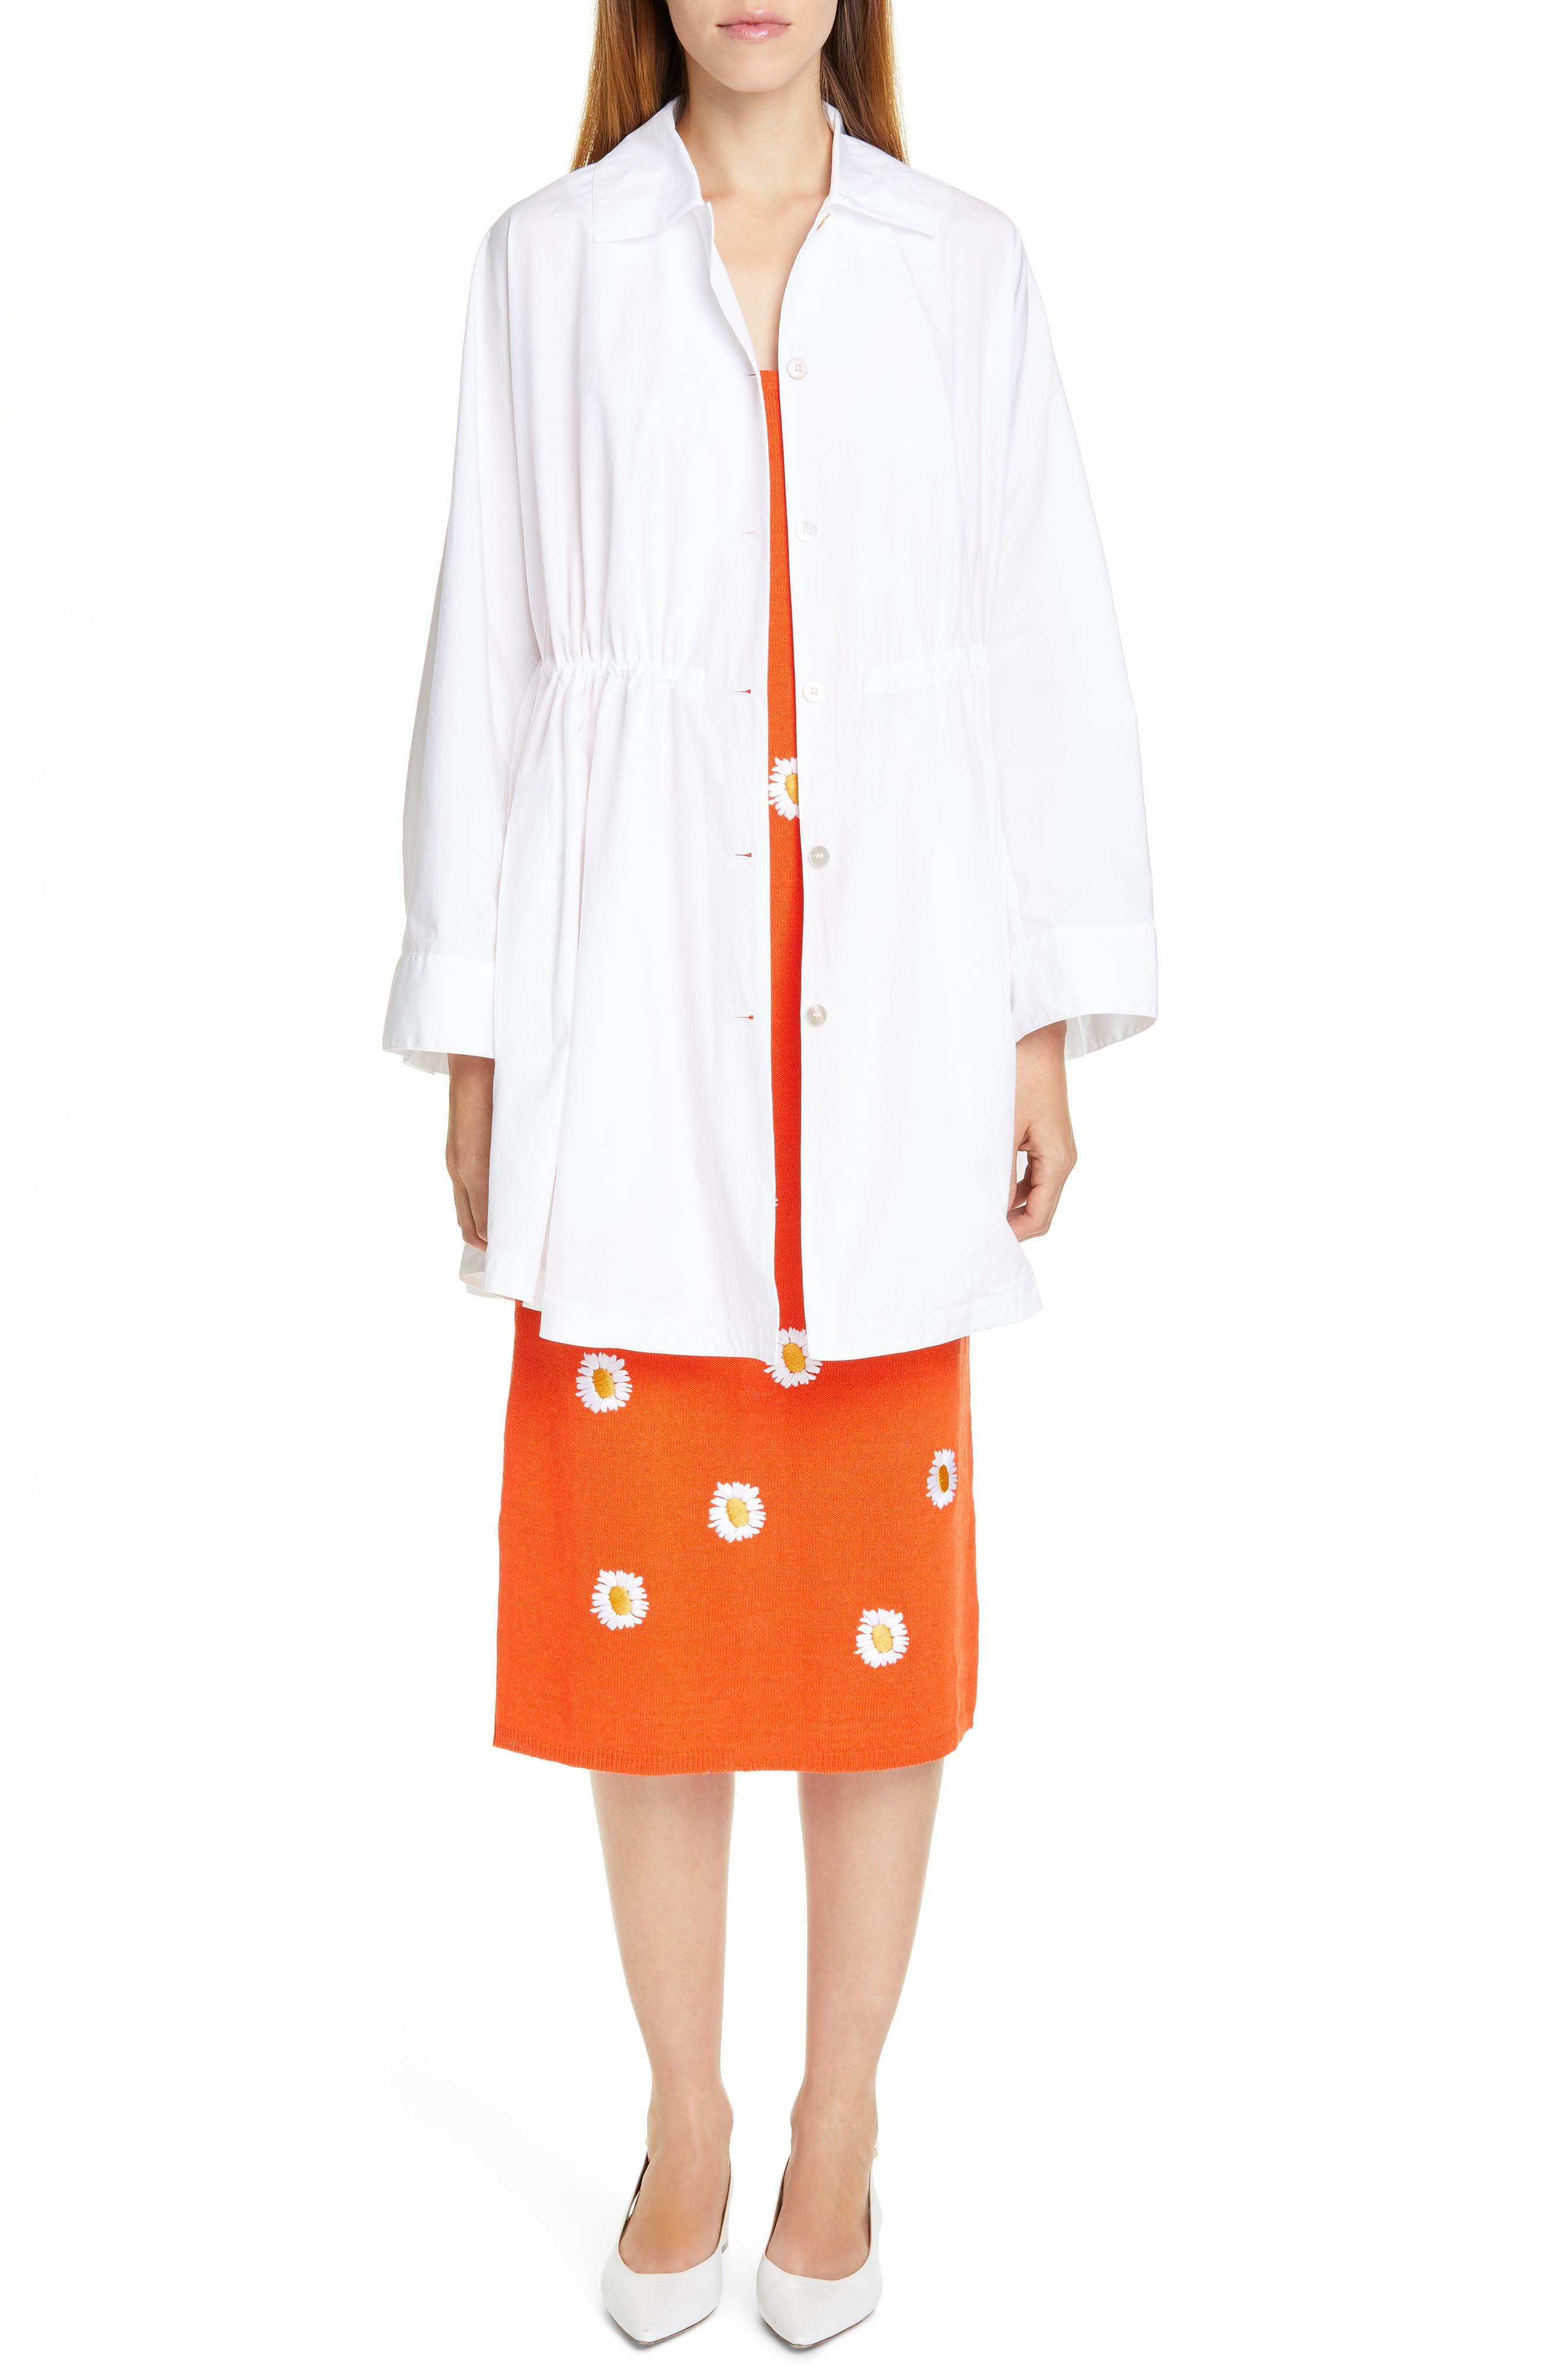 MANSUR GAVRIEL, Daisy Embroidered Midi Sweater Dress, Alternate thumbnail 8, color, ORANGE / WHITE